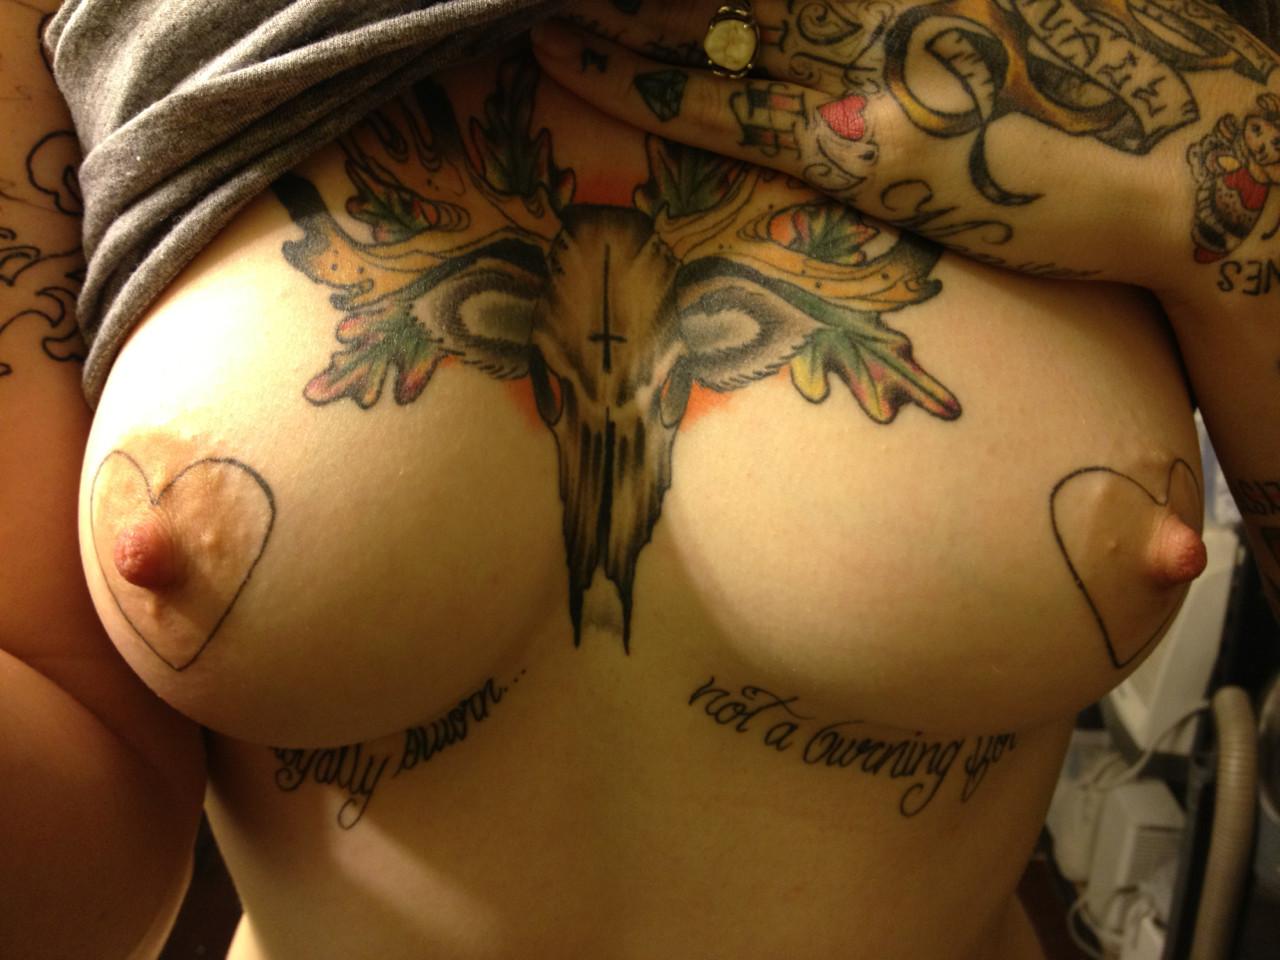 Tattoos for girls on tits, asian pornstar calendar